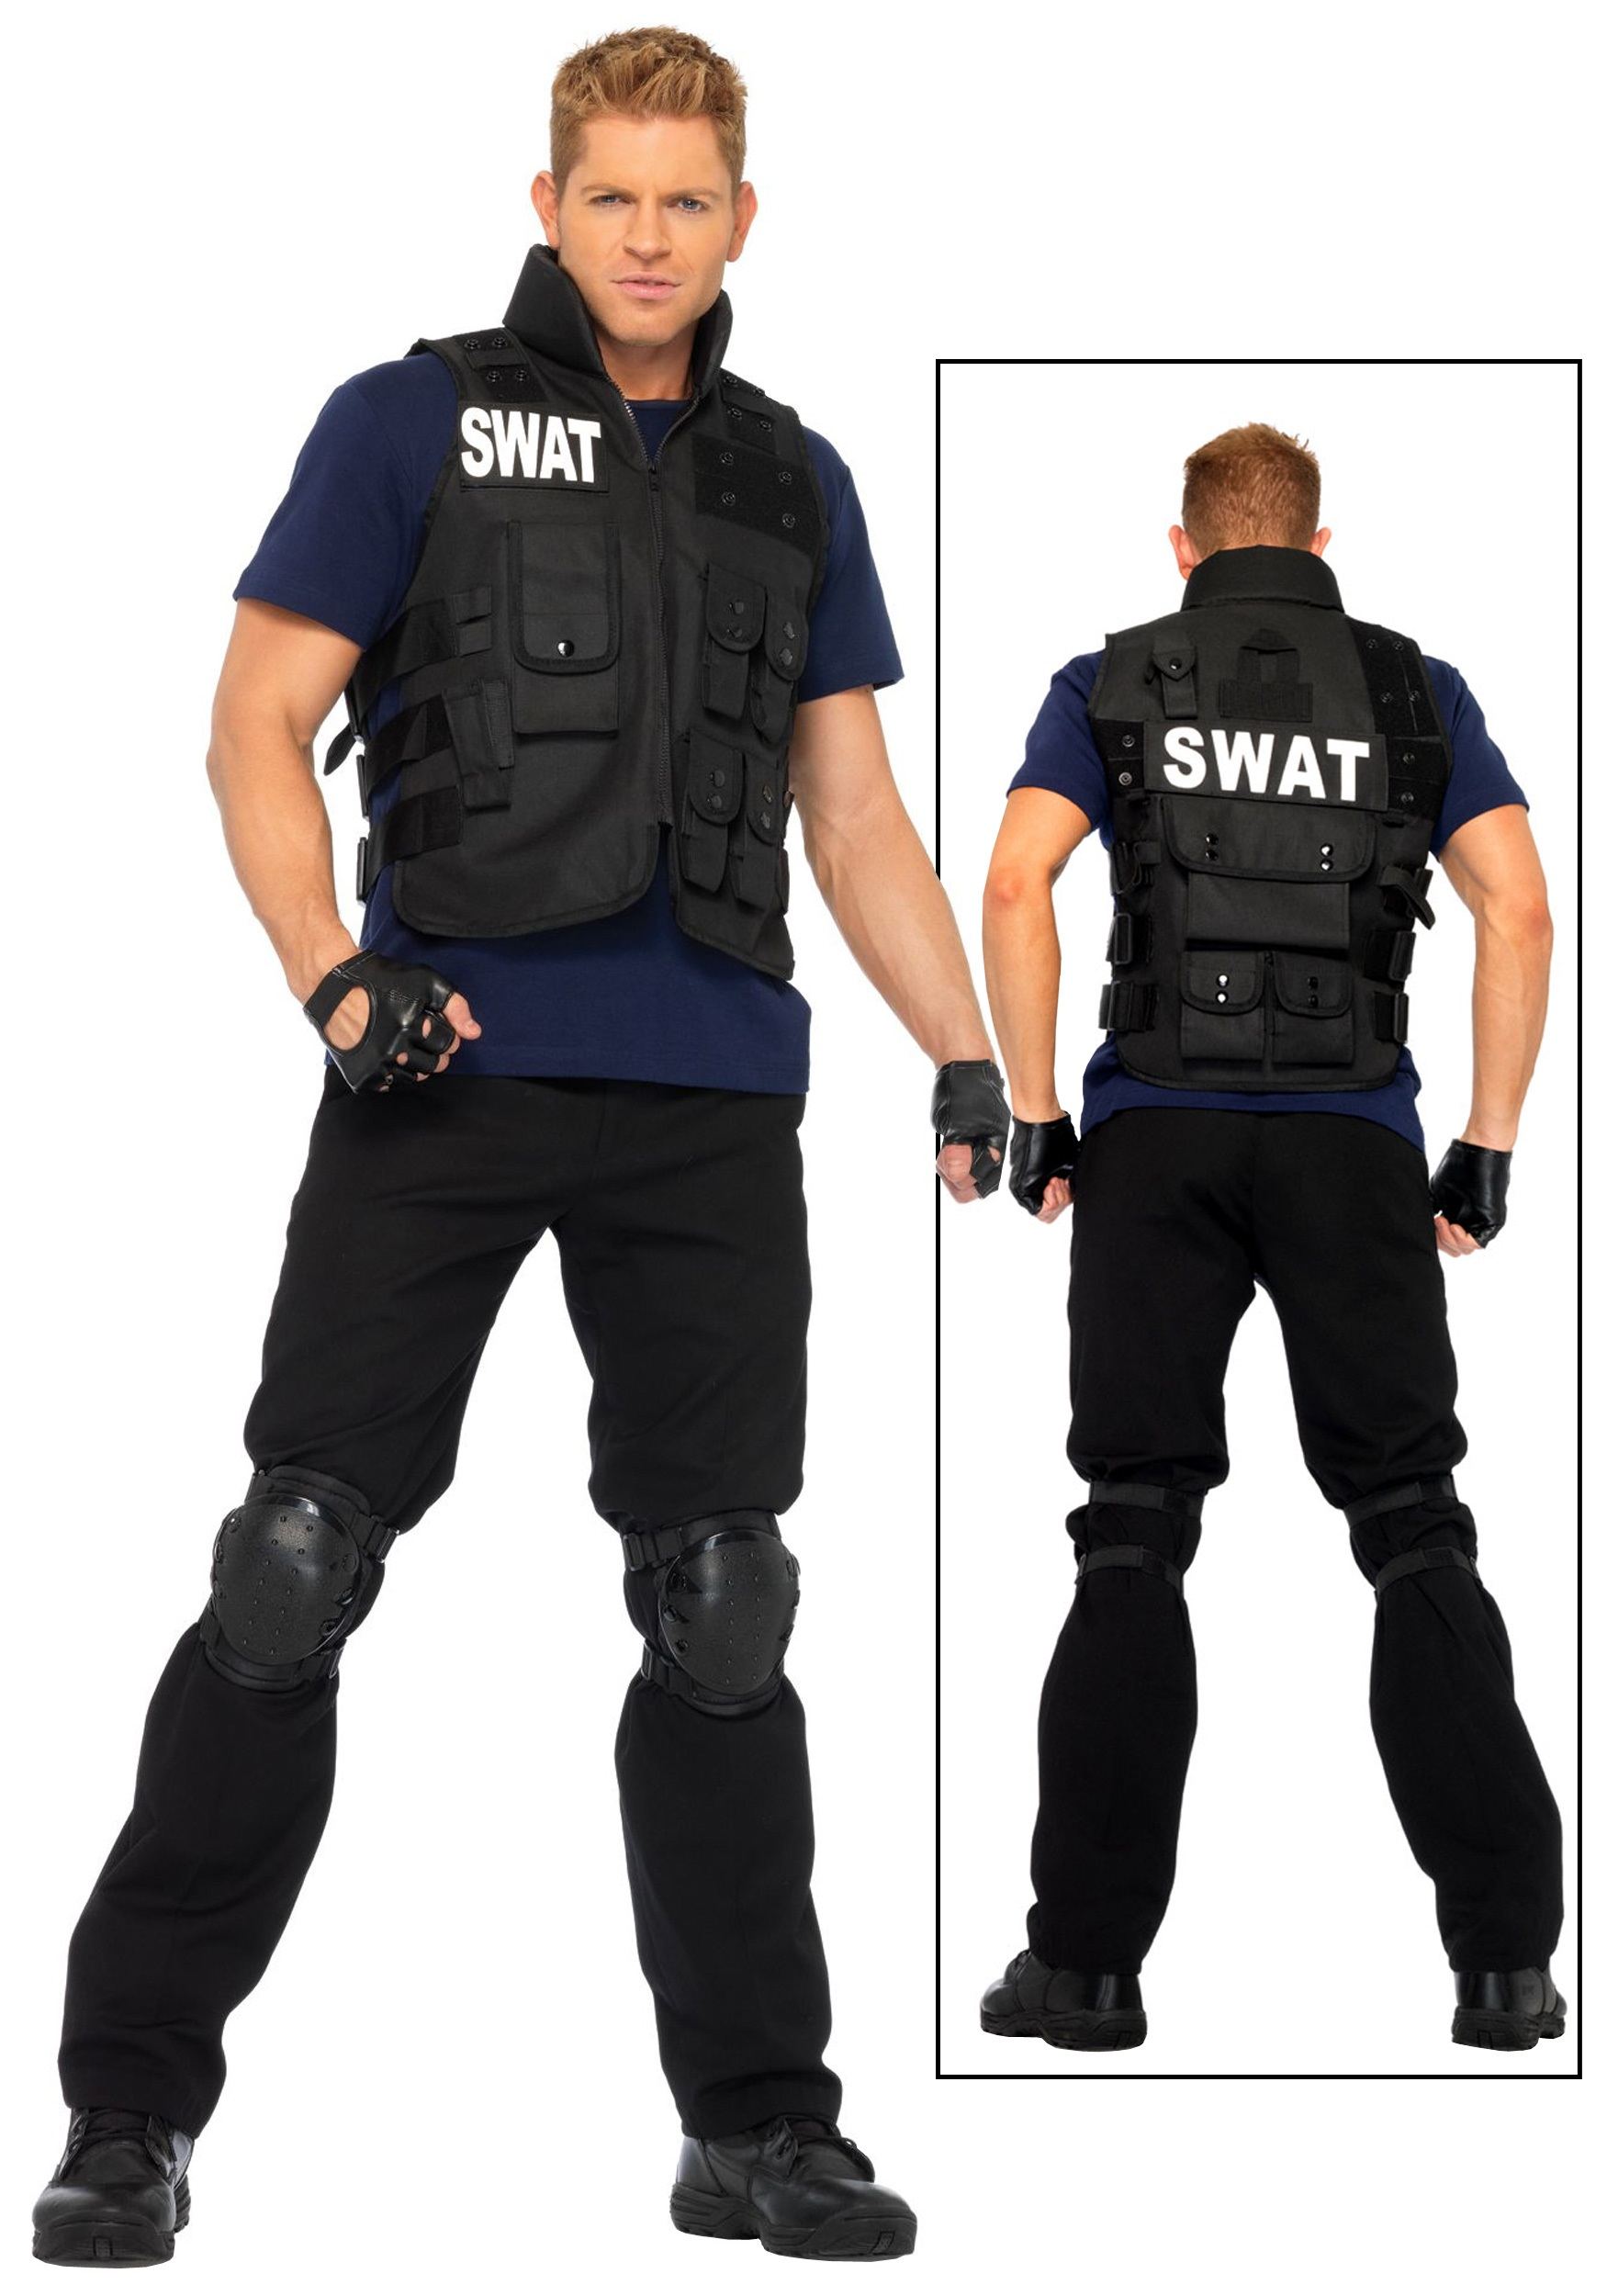 sc 1 st  Walmart & Mens SWAT Team Costume - Walmart.com